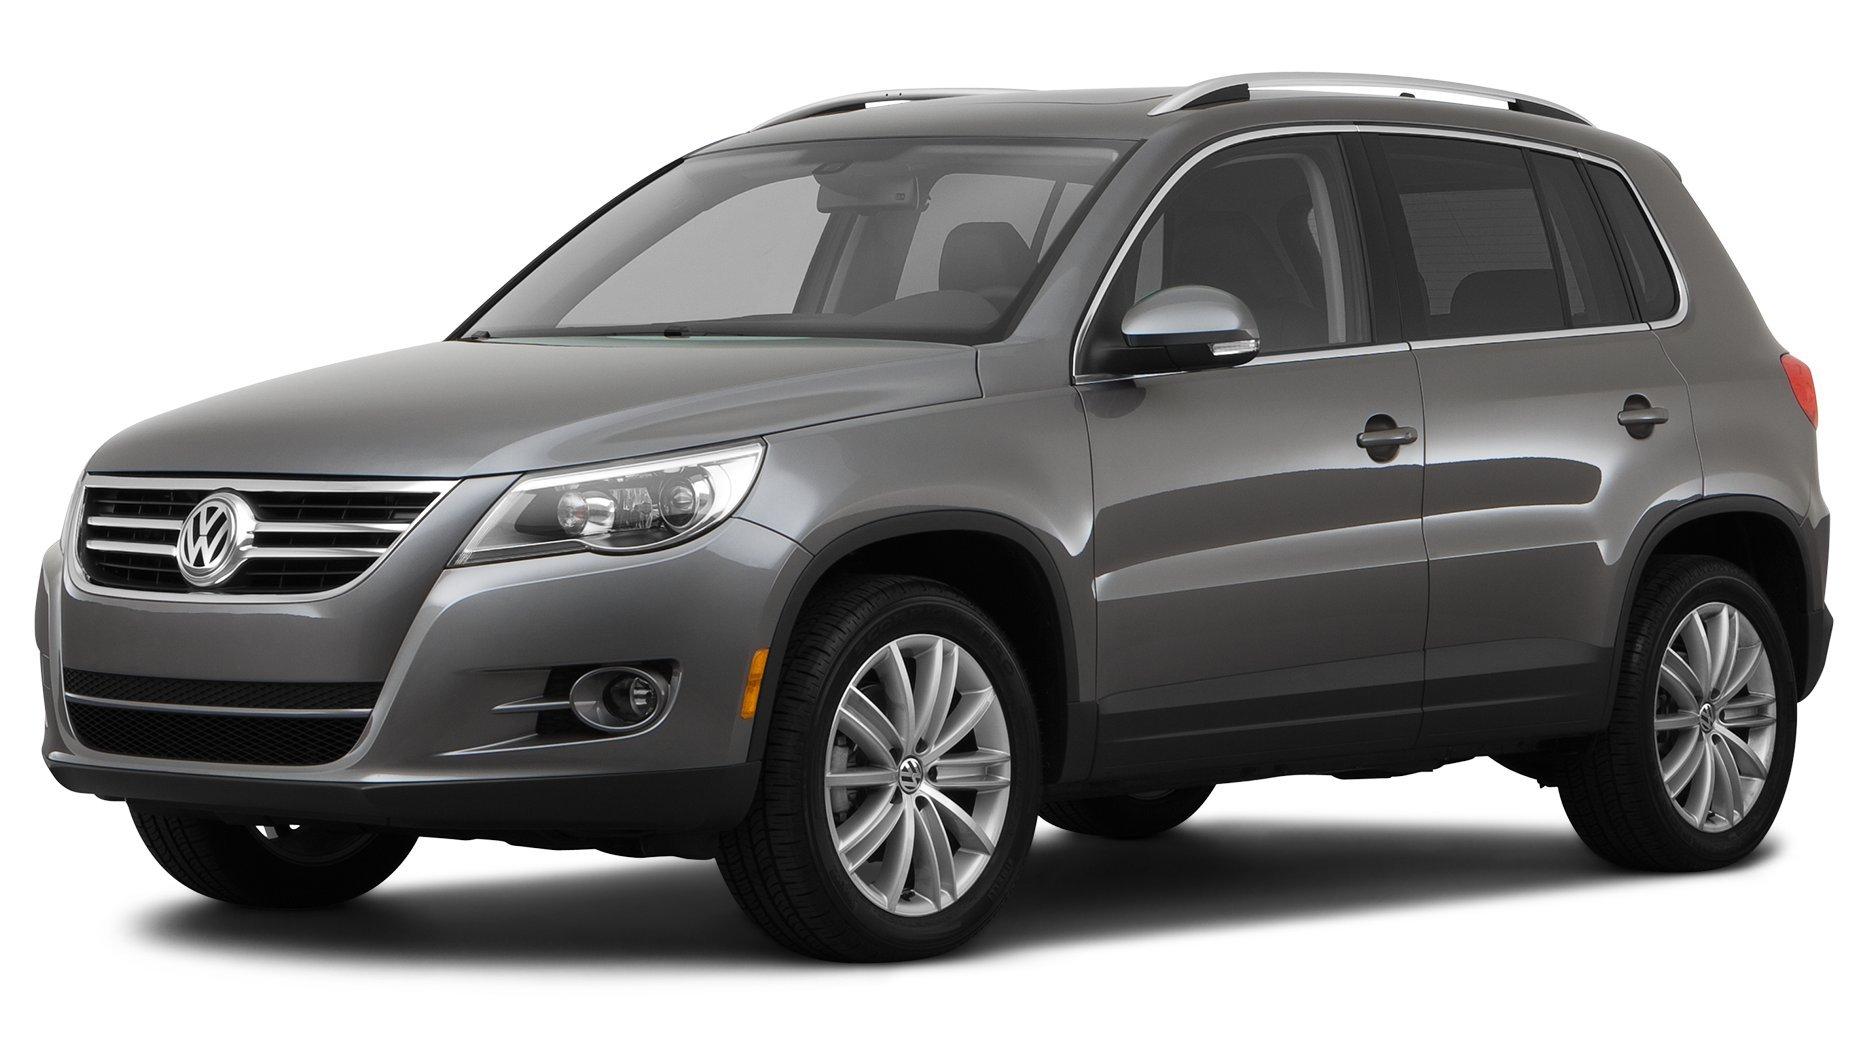 Amazon.com: 2011 Cadillac SRX Base Reviews, Images, and ...